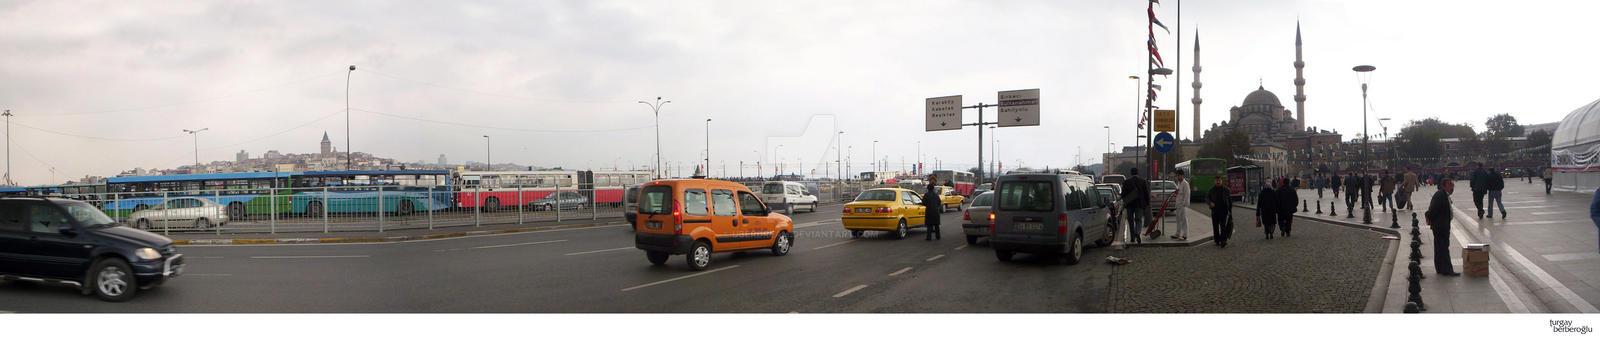 Istanbul - Eminonu - Centrum by uberdream